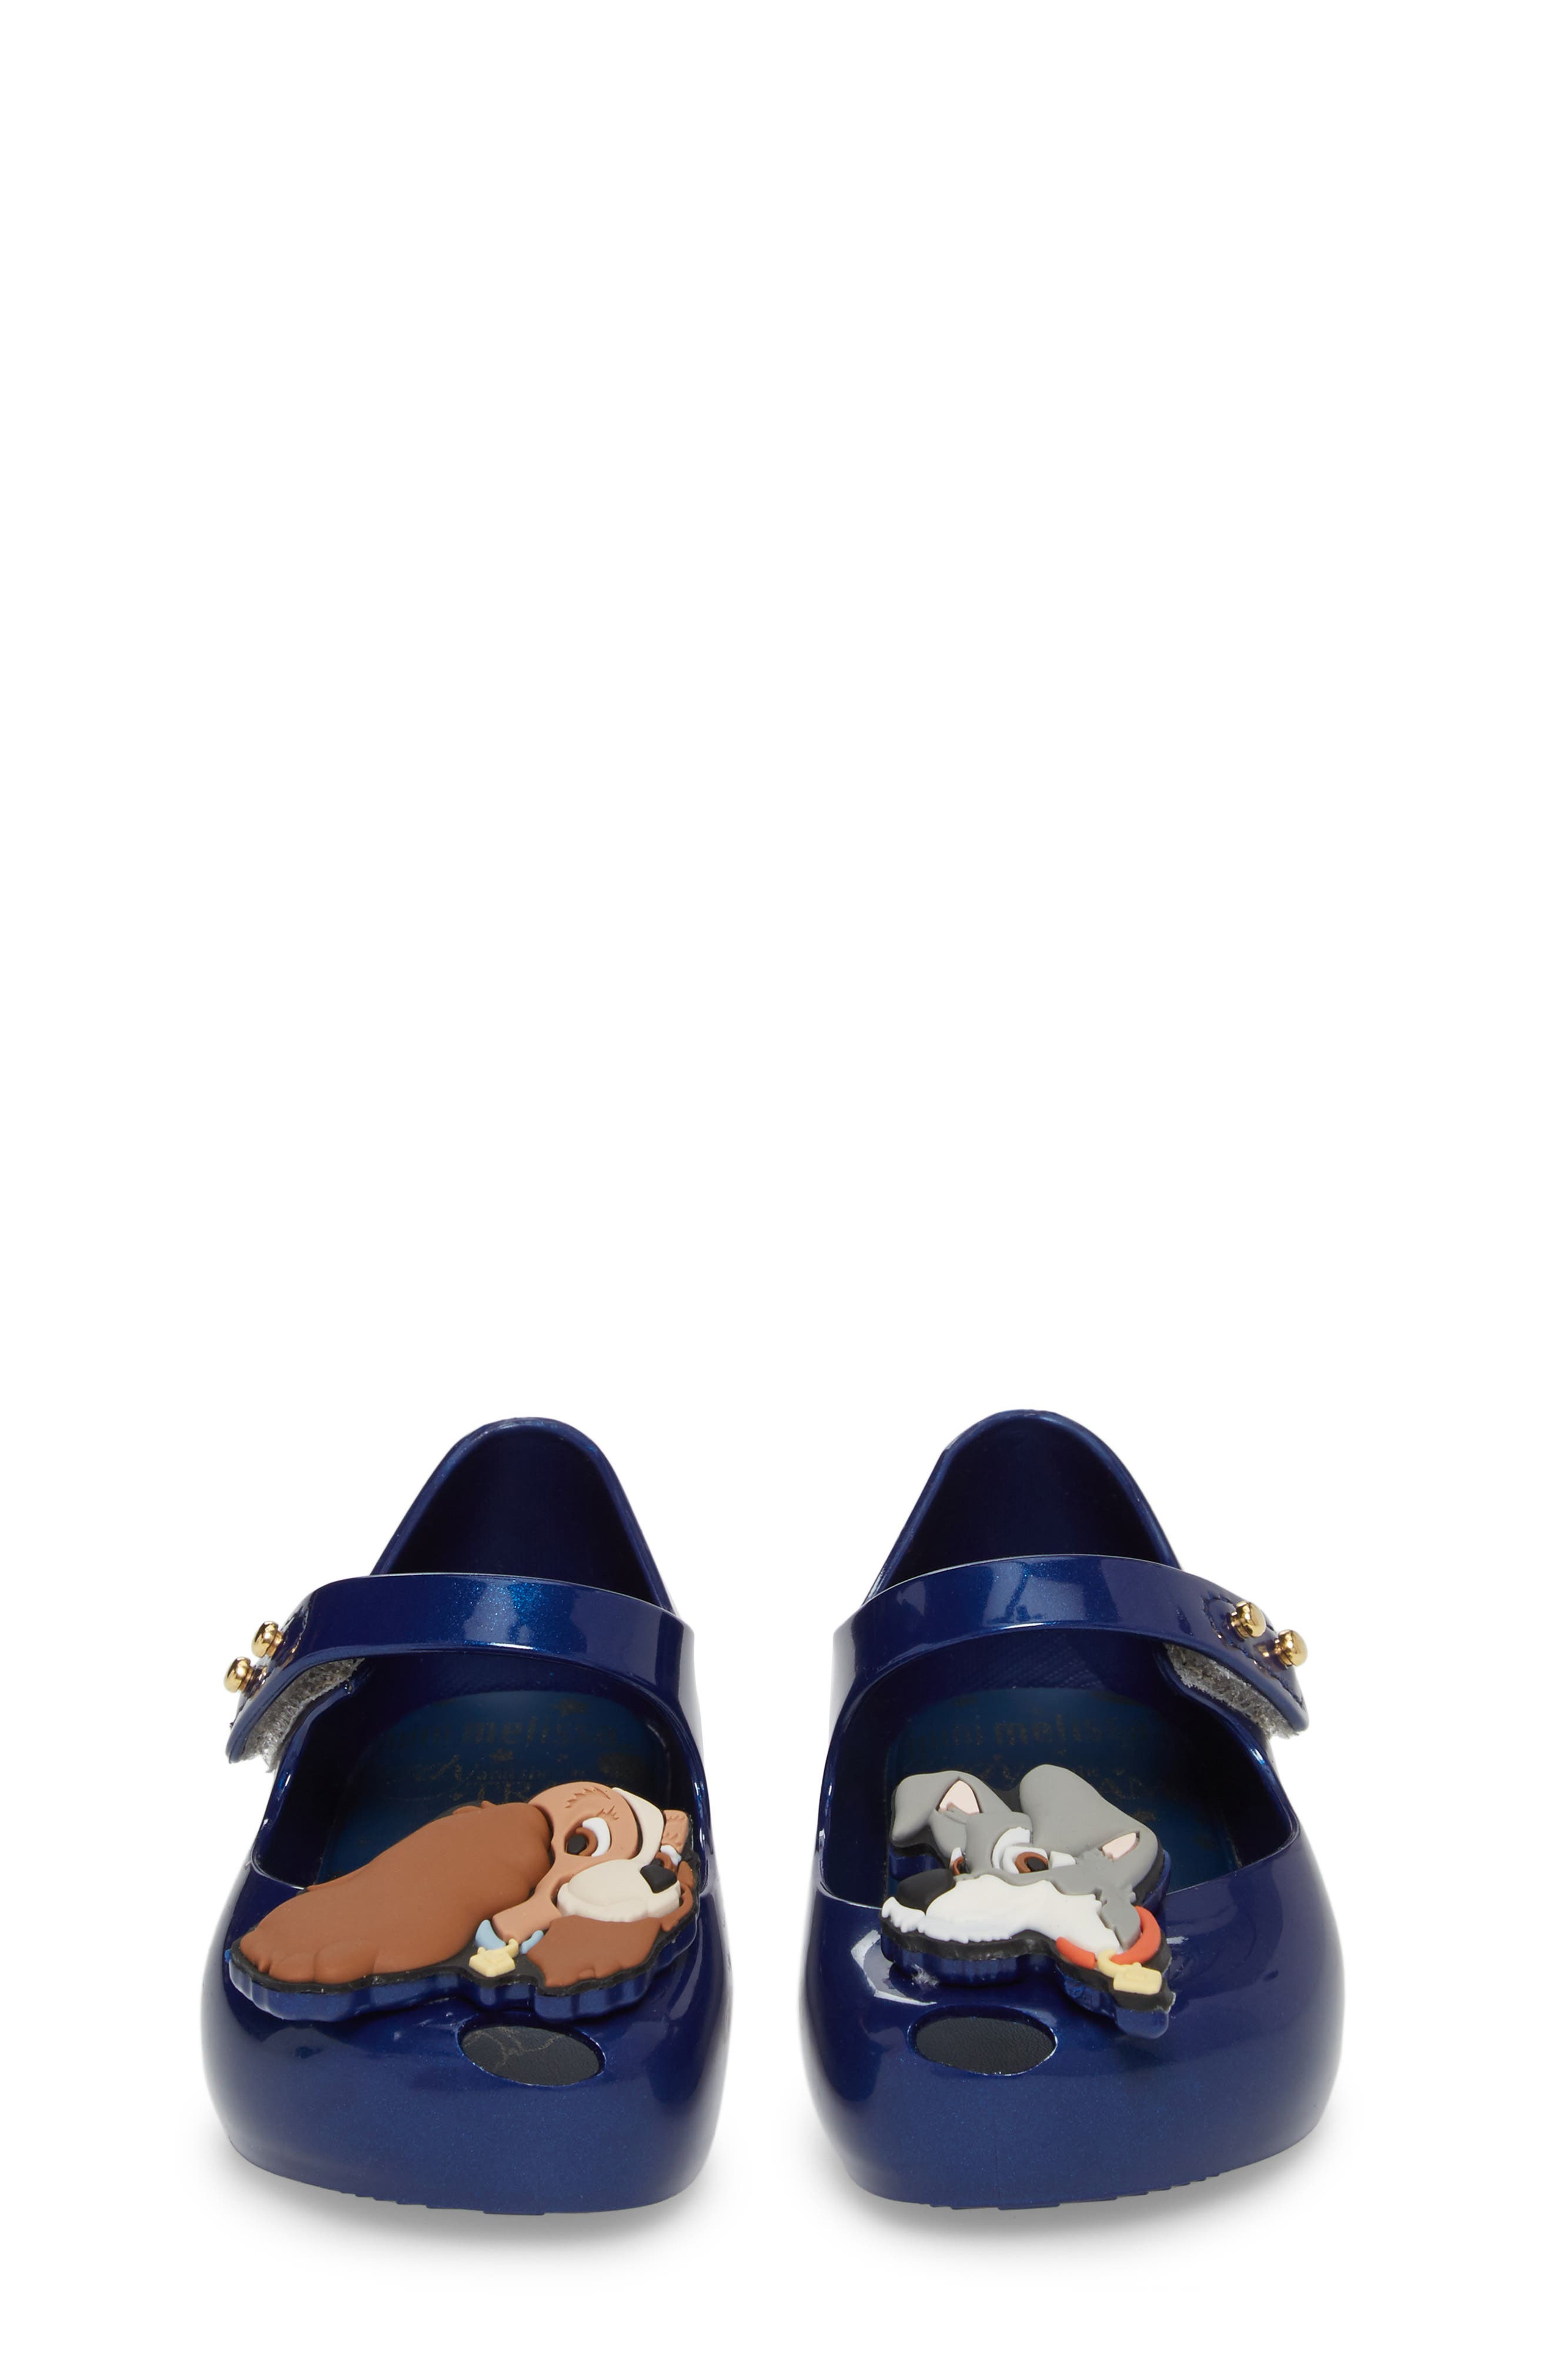 Disney<sup>®</sup> Lady & the Tramp Mini Ultragirl Flat,                             Alternate thumbnail 14, color,